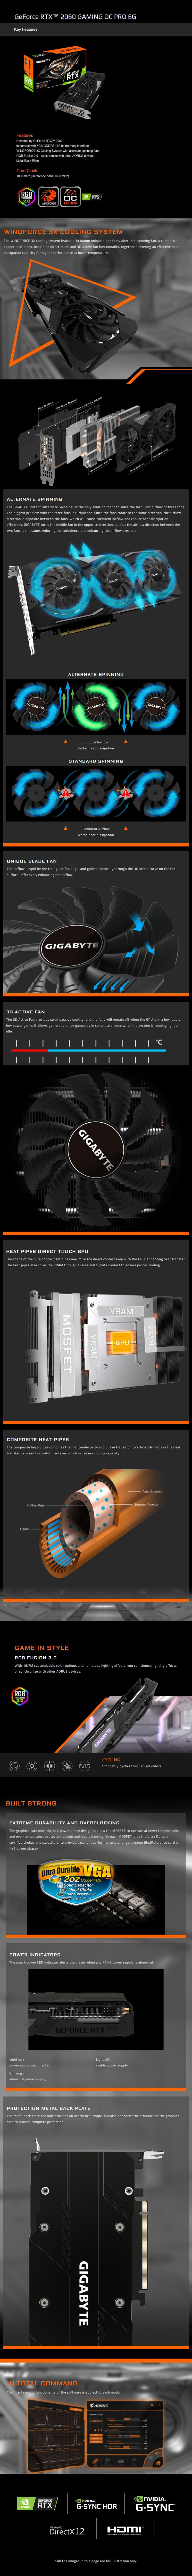 Gigabyte GeForce RTX 2060 Gaming OC PRO 6GB Video Card - Desktop Overview 1